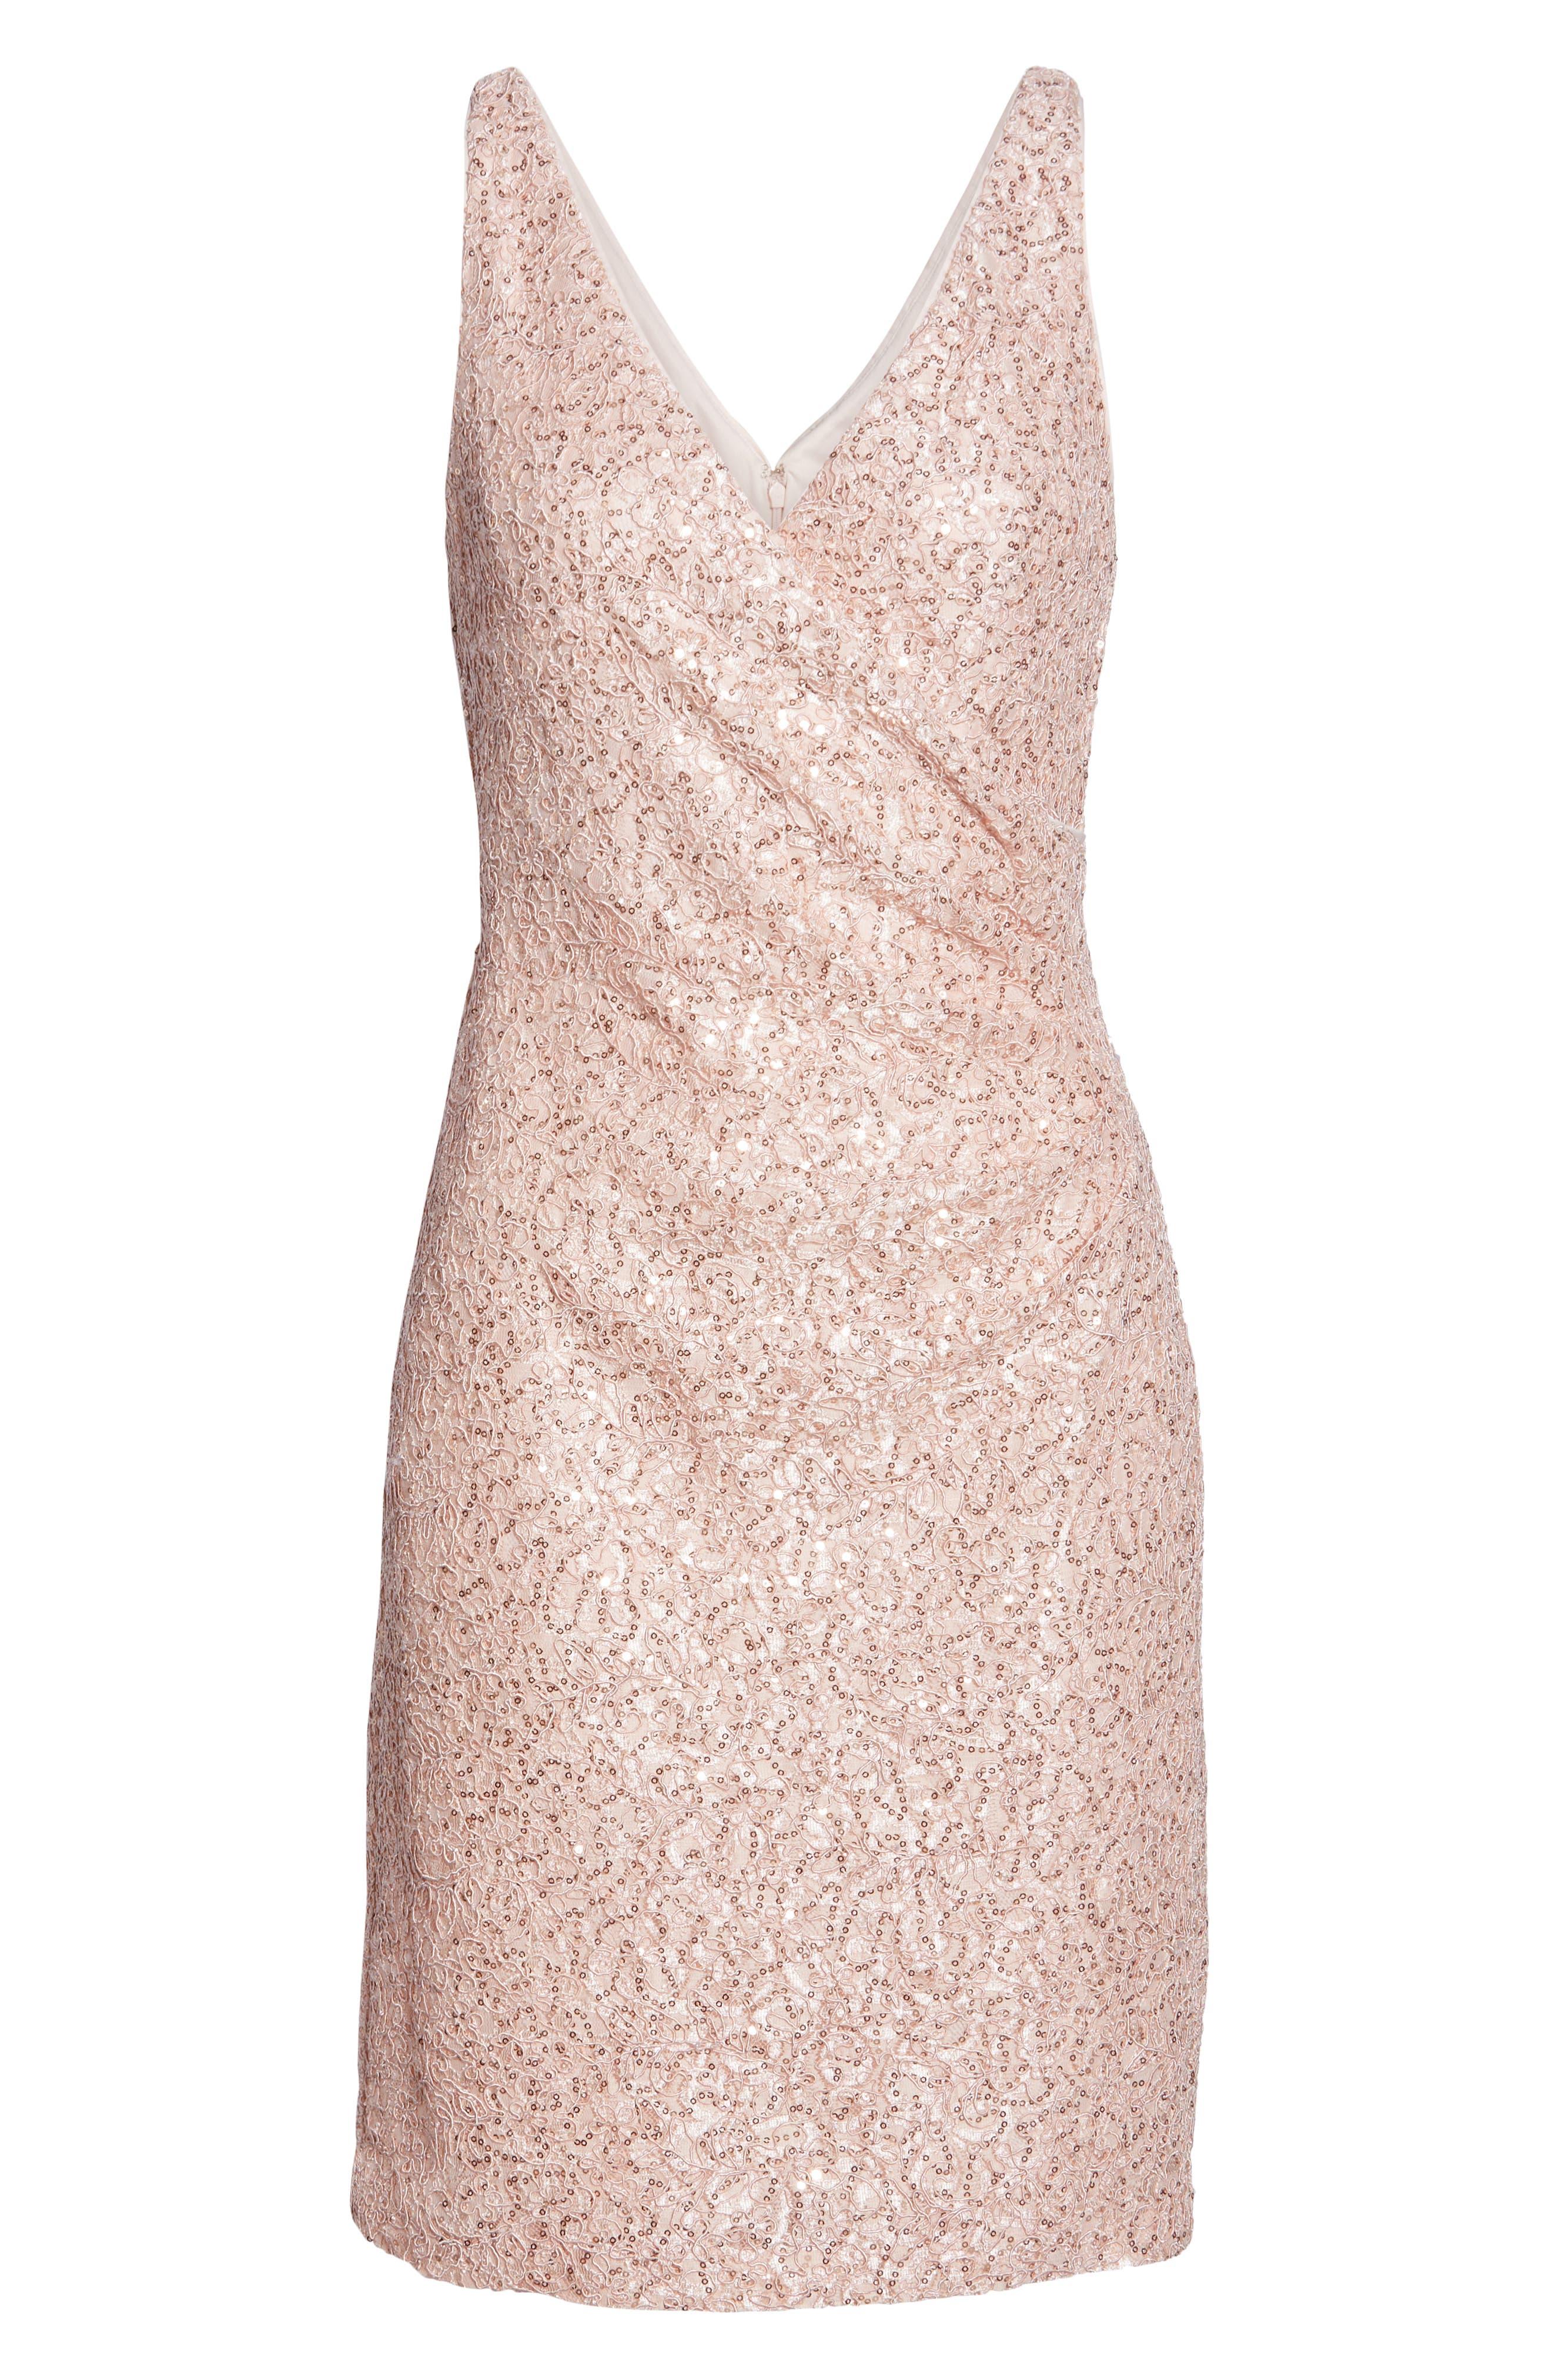 VINCE CAMUTO, Sleeveless V-Neck Embellished Cocktail Dress, Alternate thumbnail 7, color, BLUSH